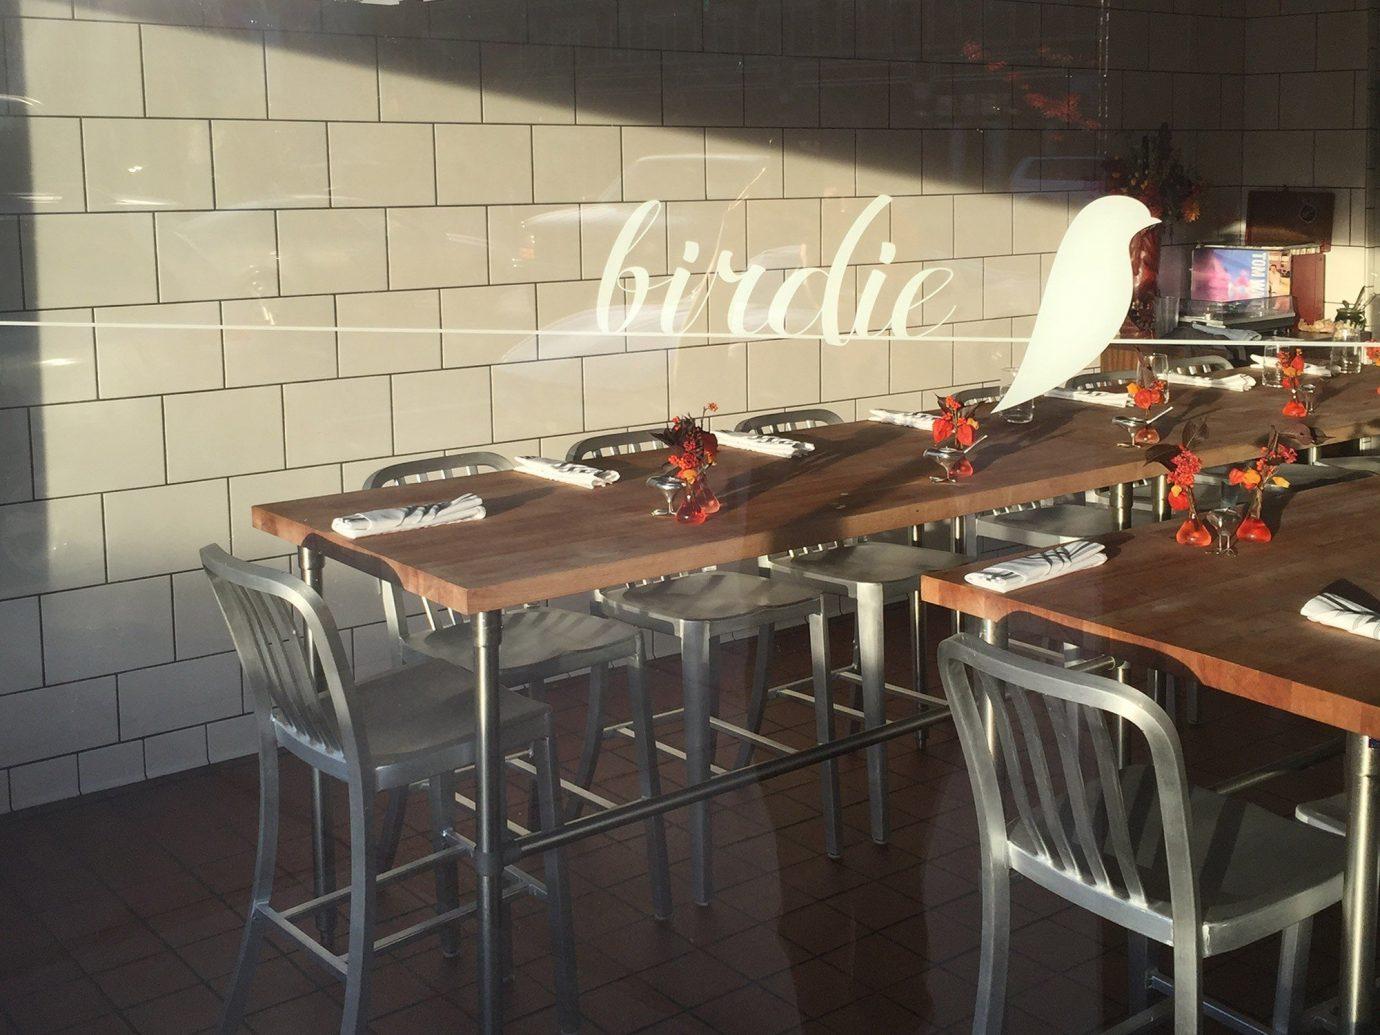 Food + Drink floor restaurant metal table meal Bar